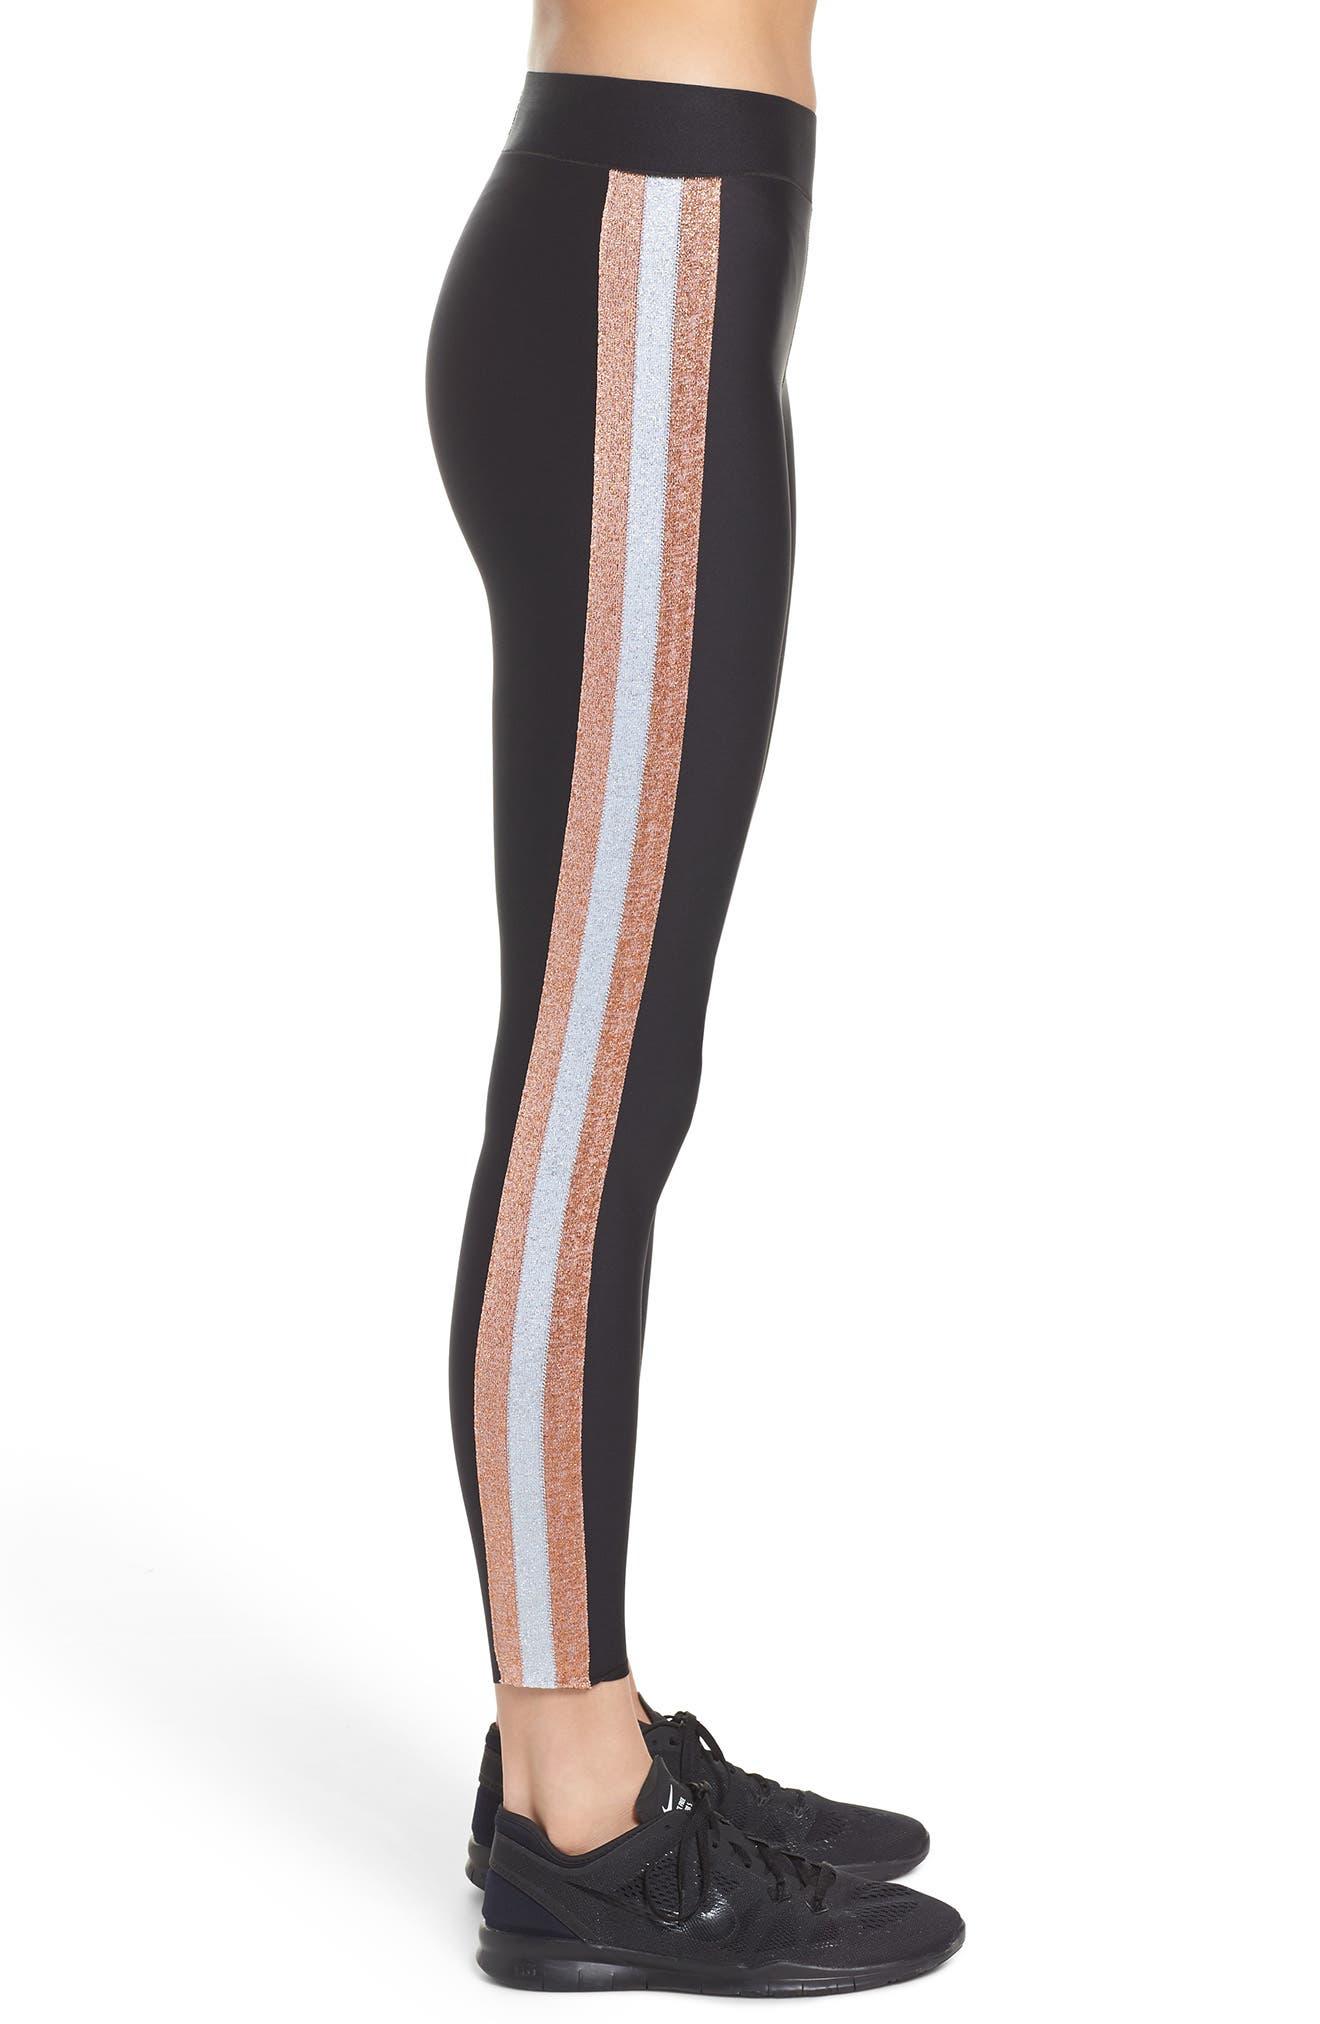 Ultra Lux Collegiate Leggings,                             Alternate thumbnail 3, color,                             Nero Rose Silver